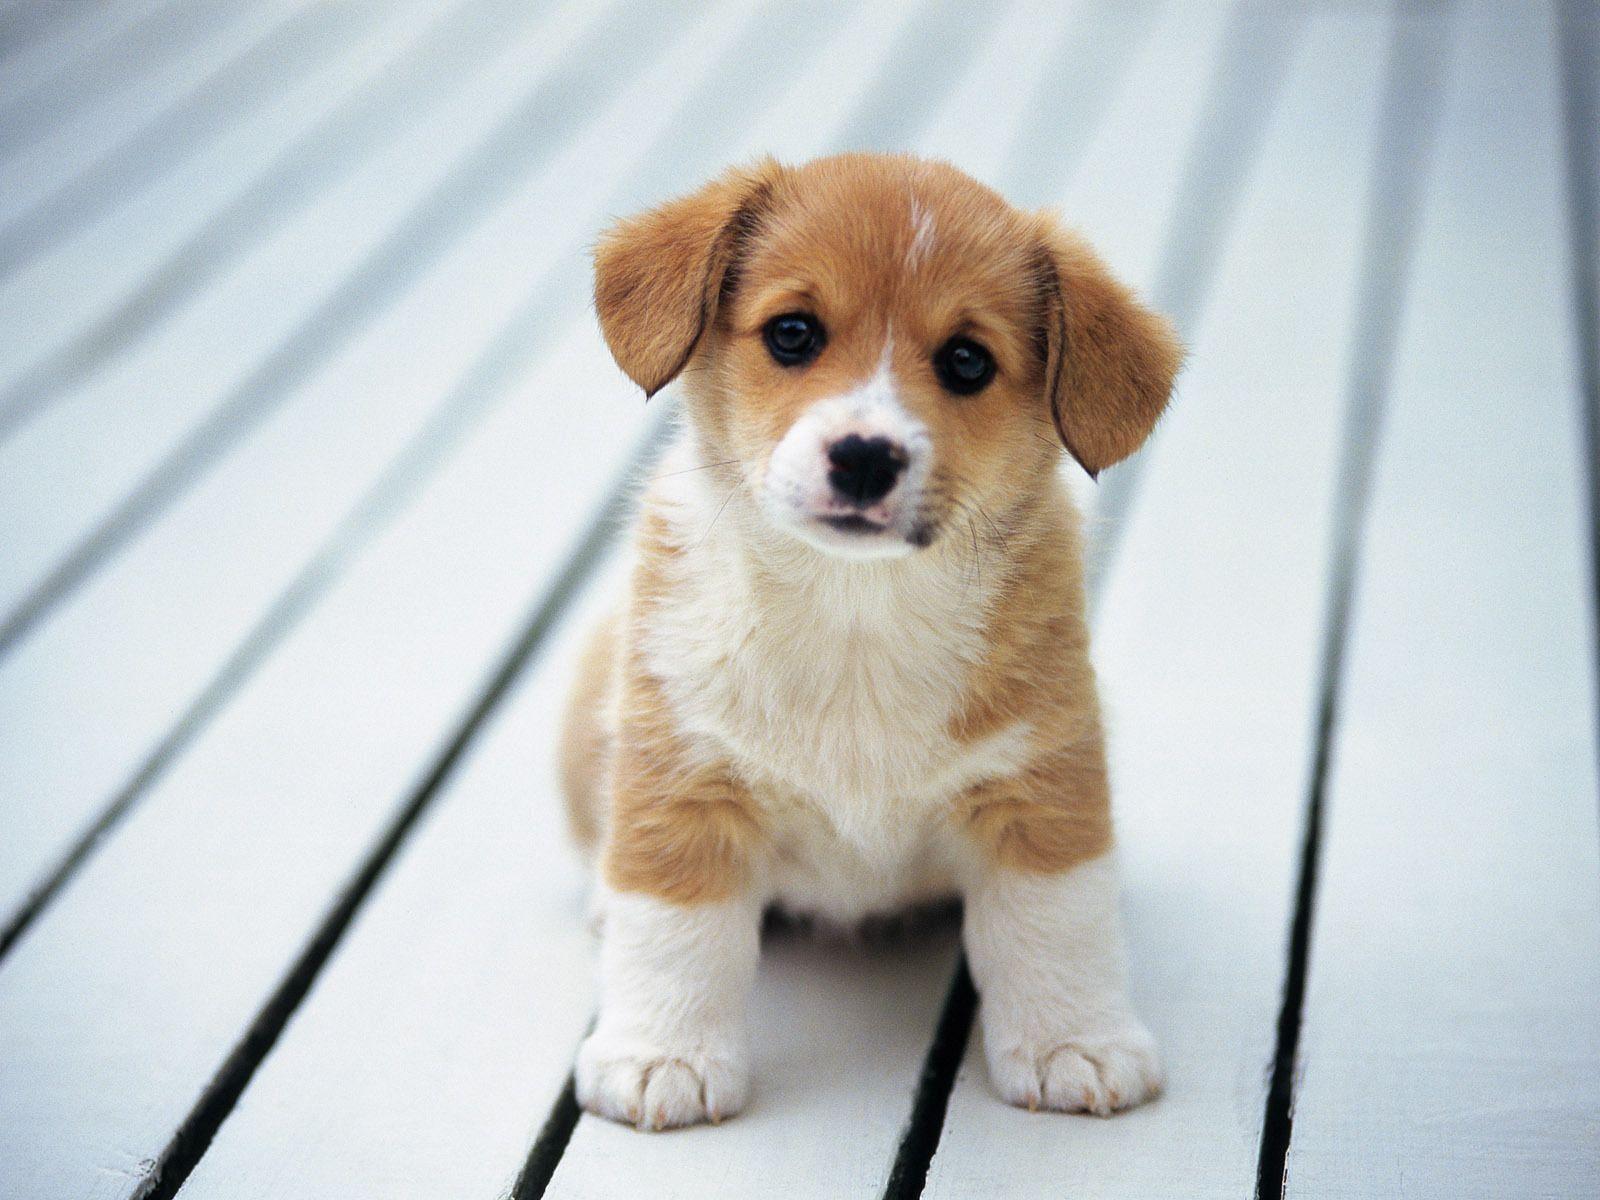 Cute puppy videos cutepuppiesu on pinterest